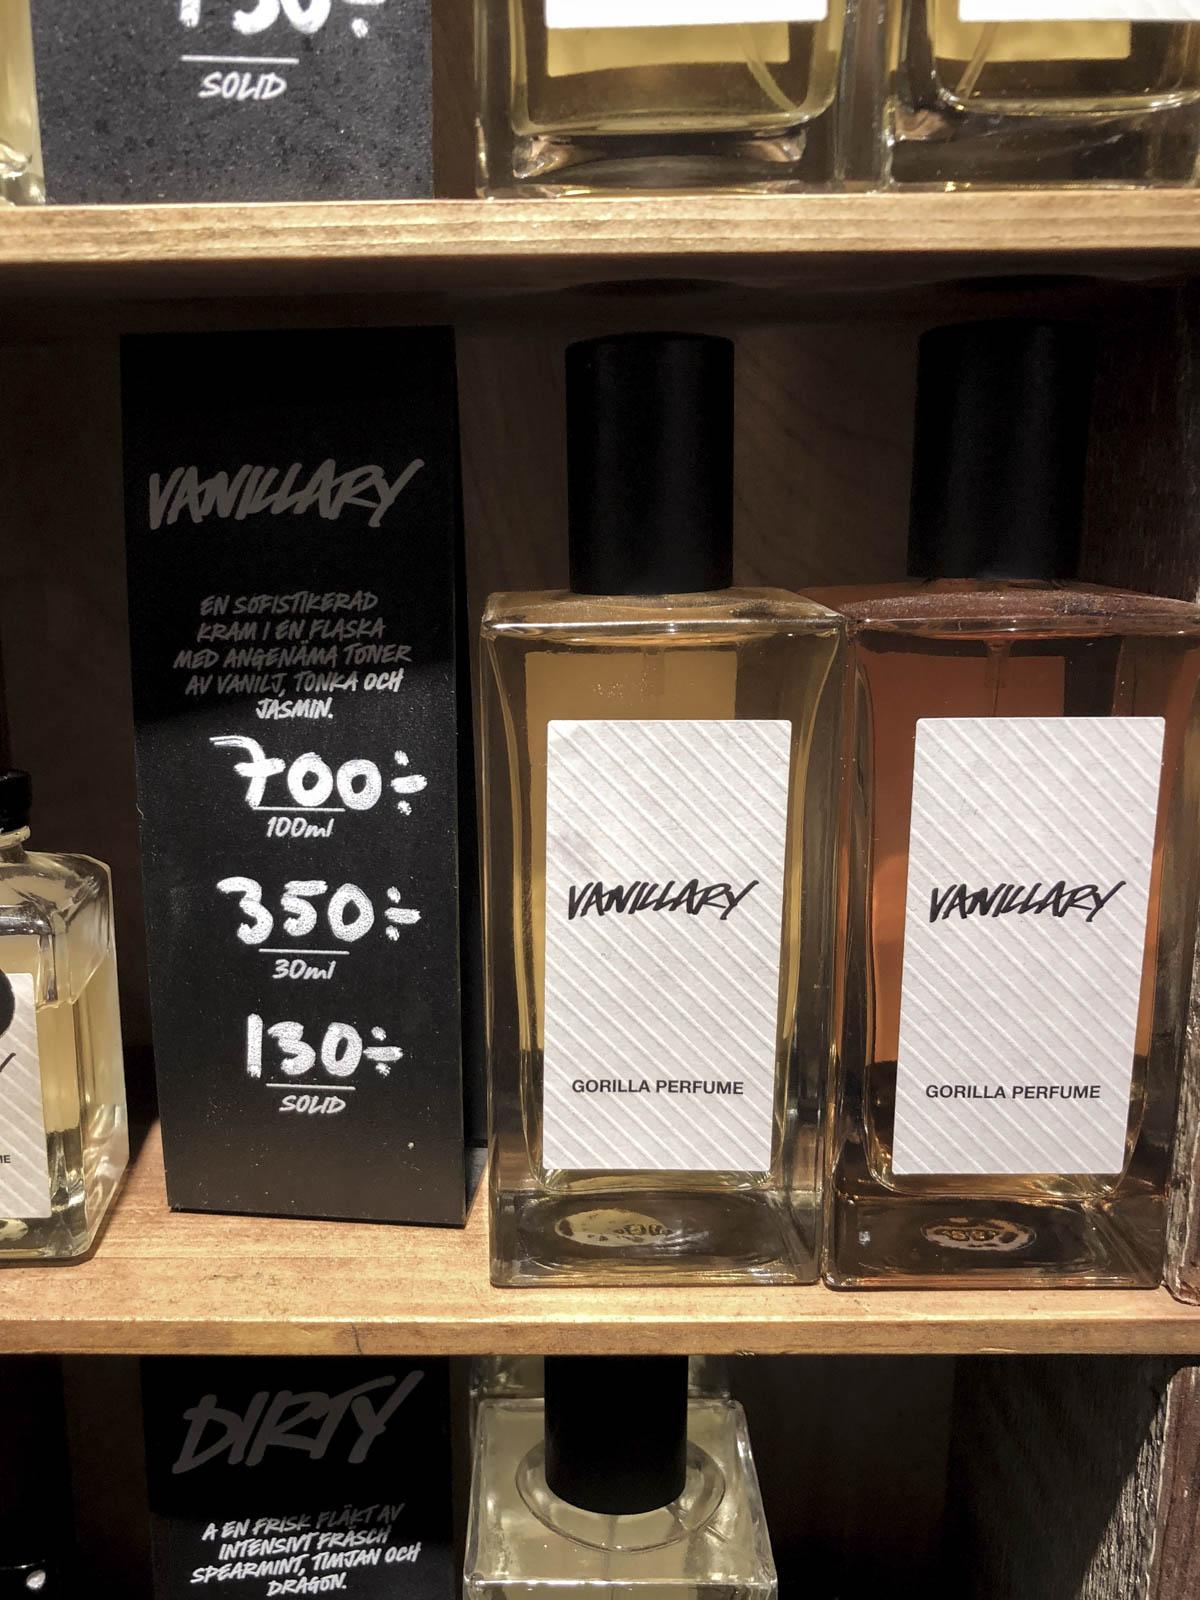 Lush Vanillary Parfym